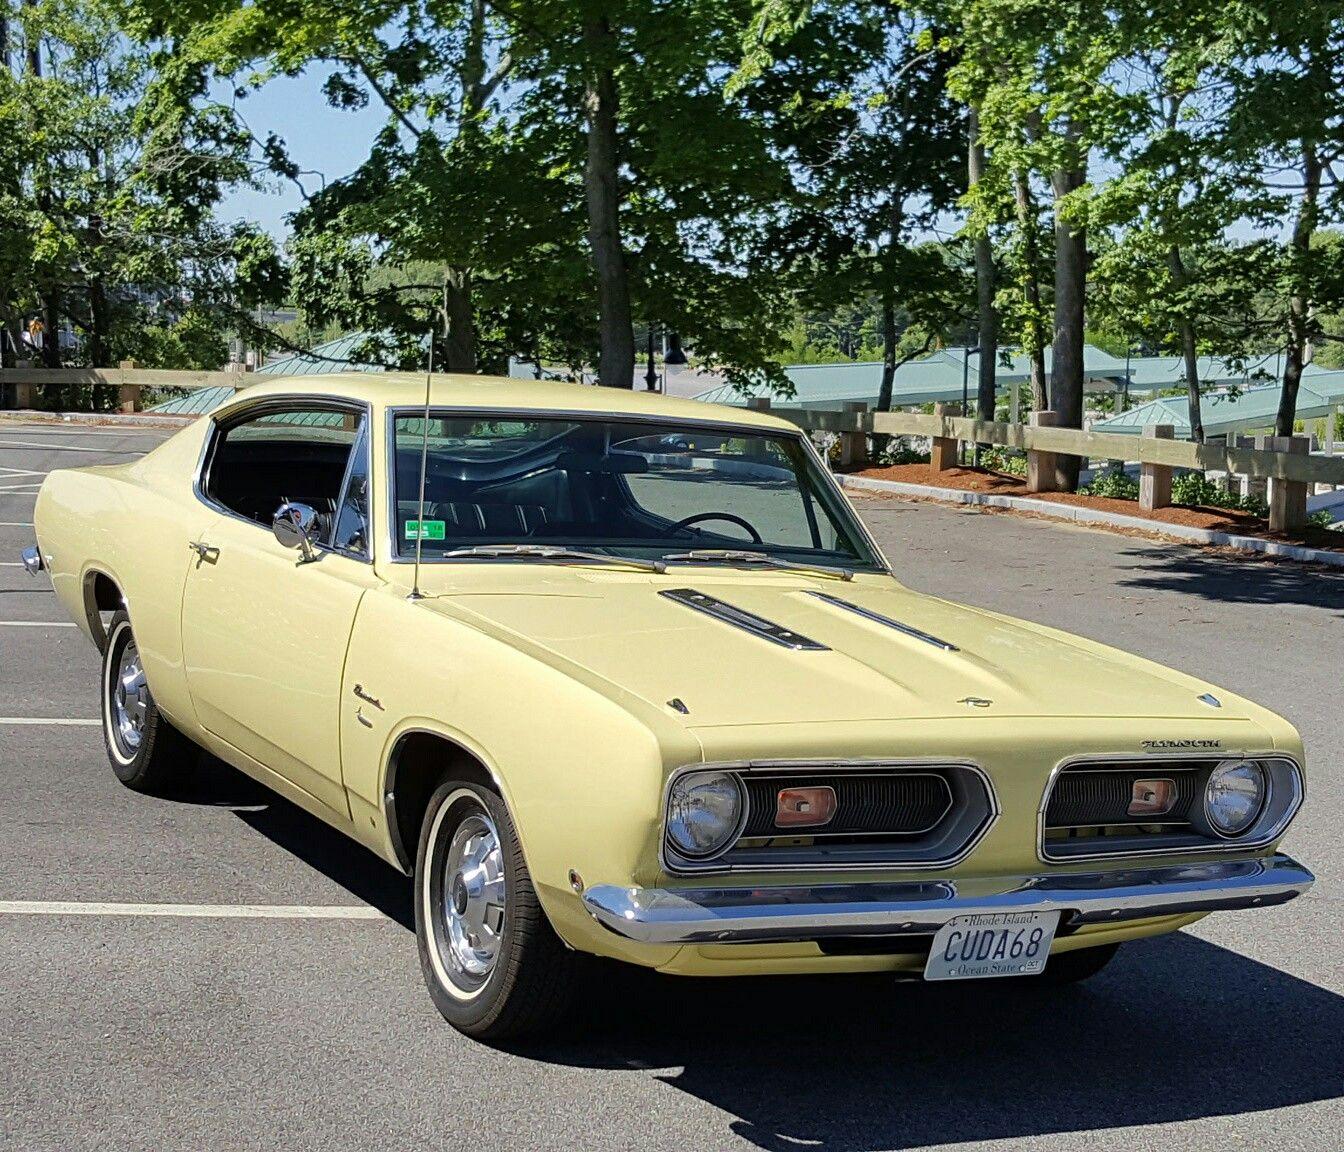 1968 Plymouth Barracuda, 225 Slant,6, Sunfire Yellow